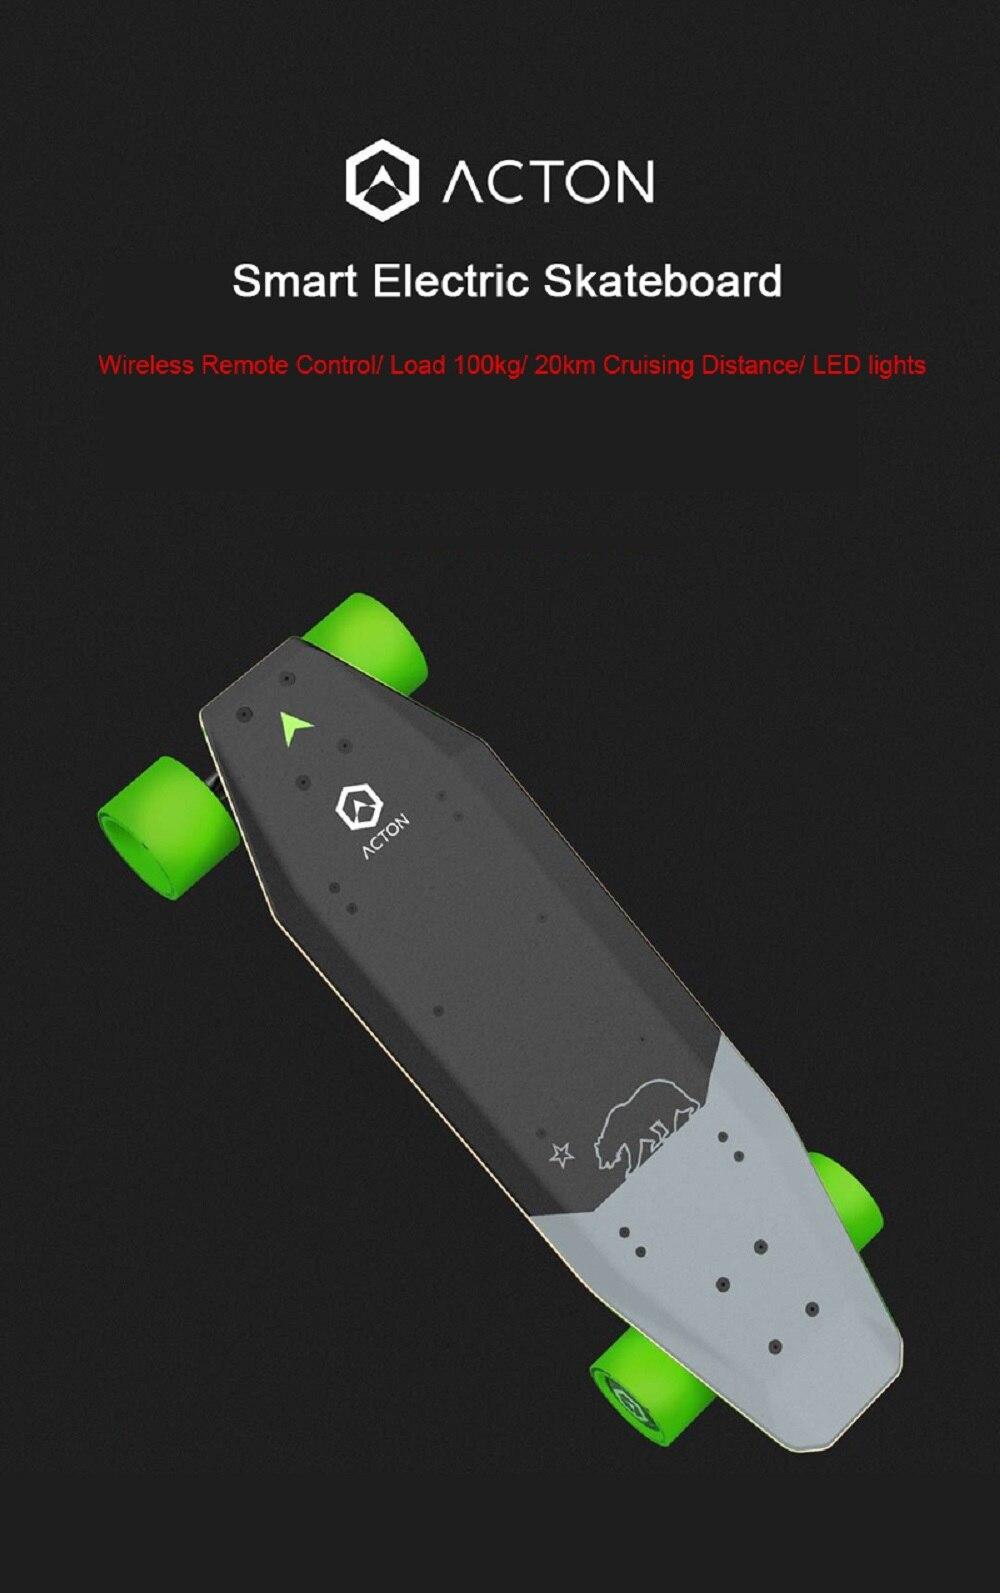 -Xiaomi-ACTON-Smart-Wireless-Remote-Control-Electric-Skateboard--1